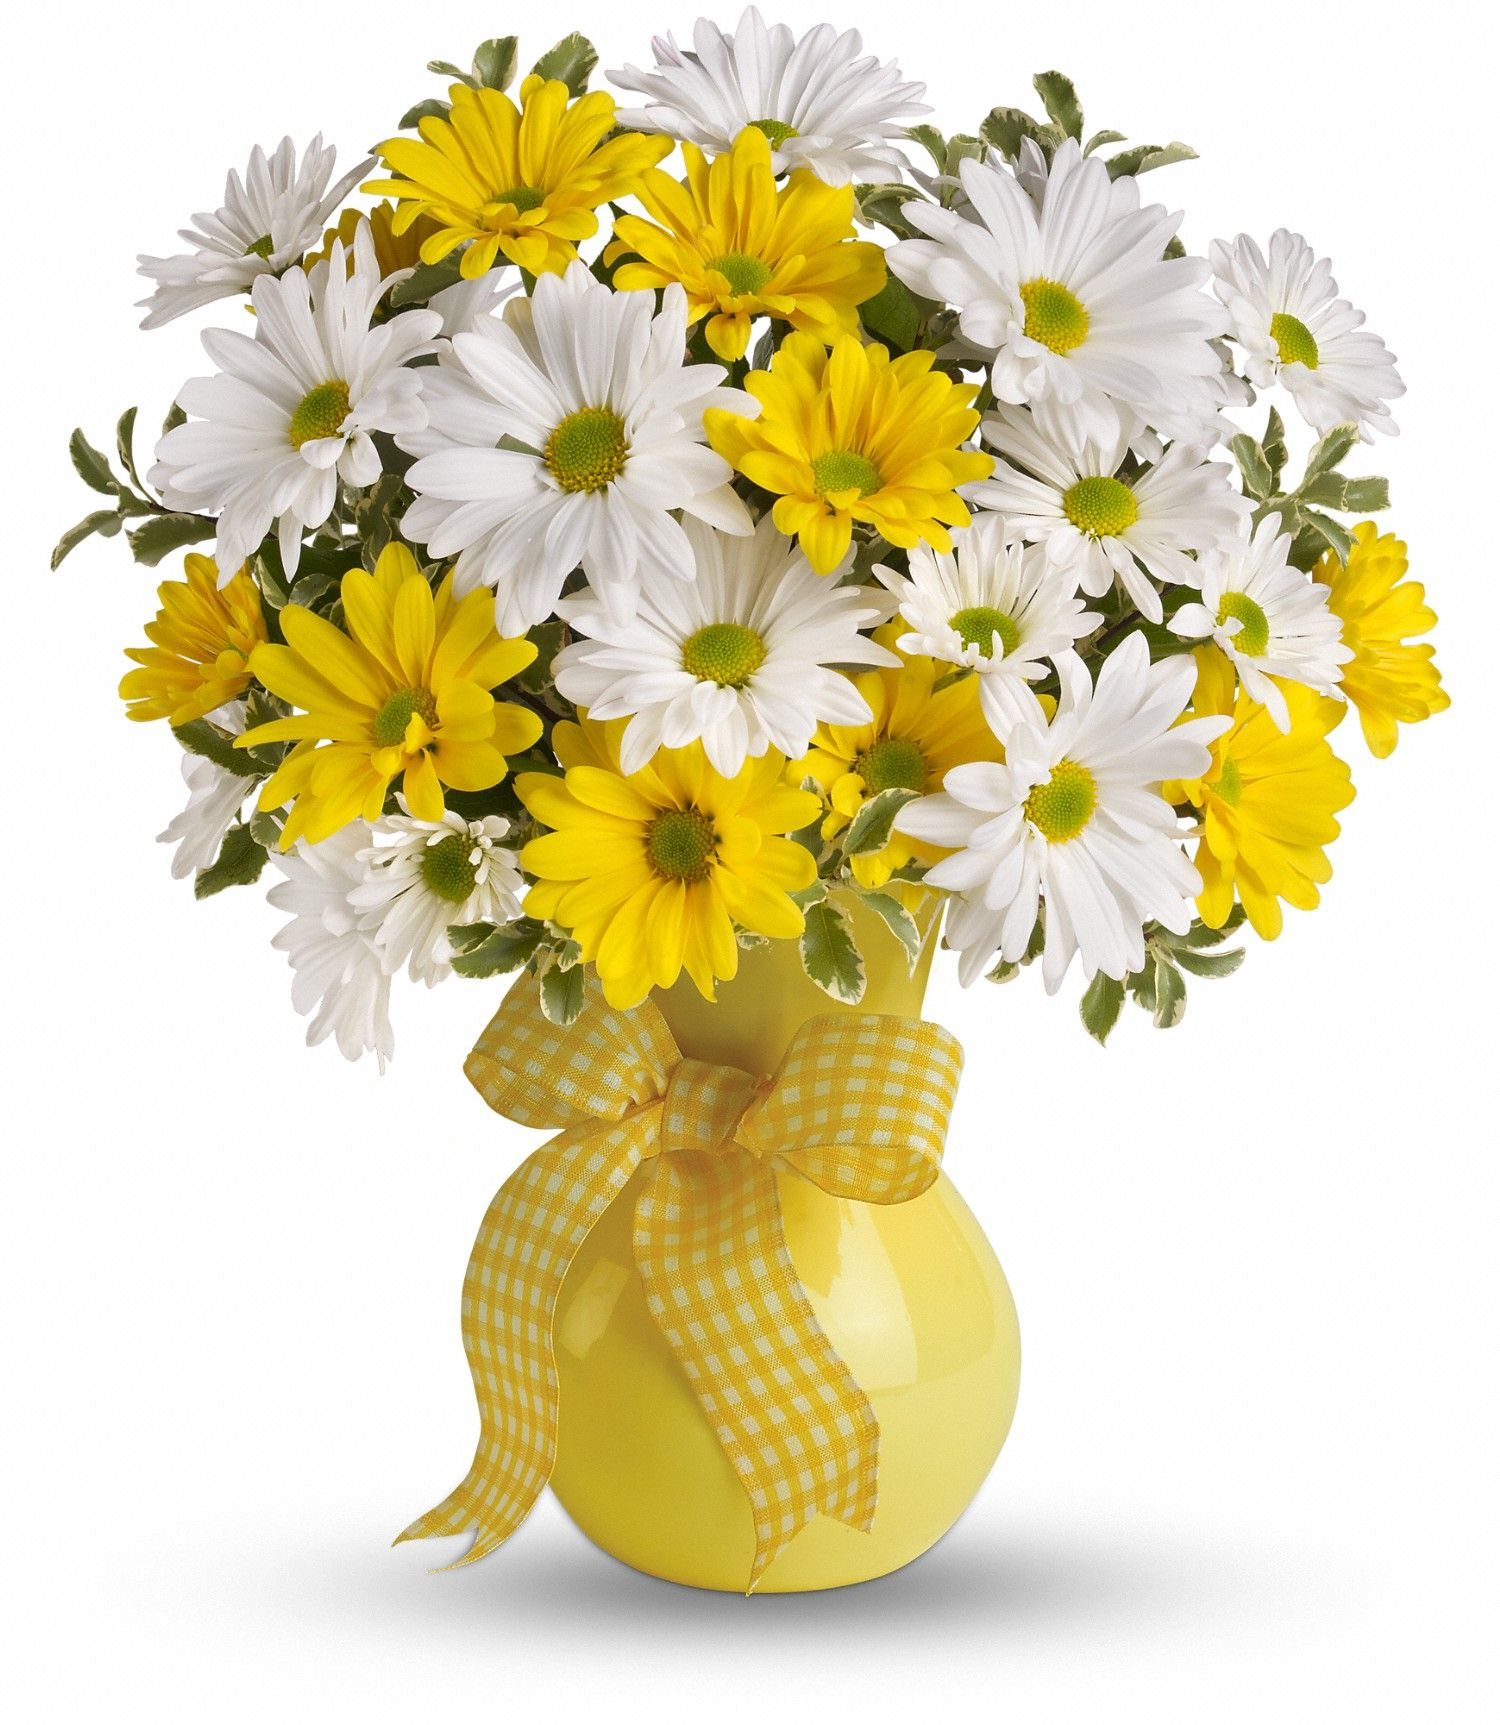 Classic yellow white daisy bouquet white daisy bouquet